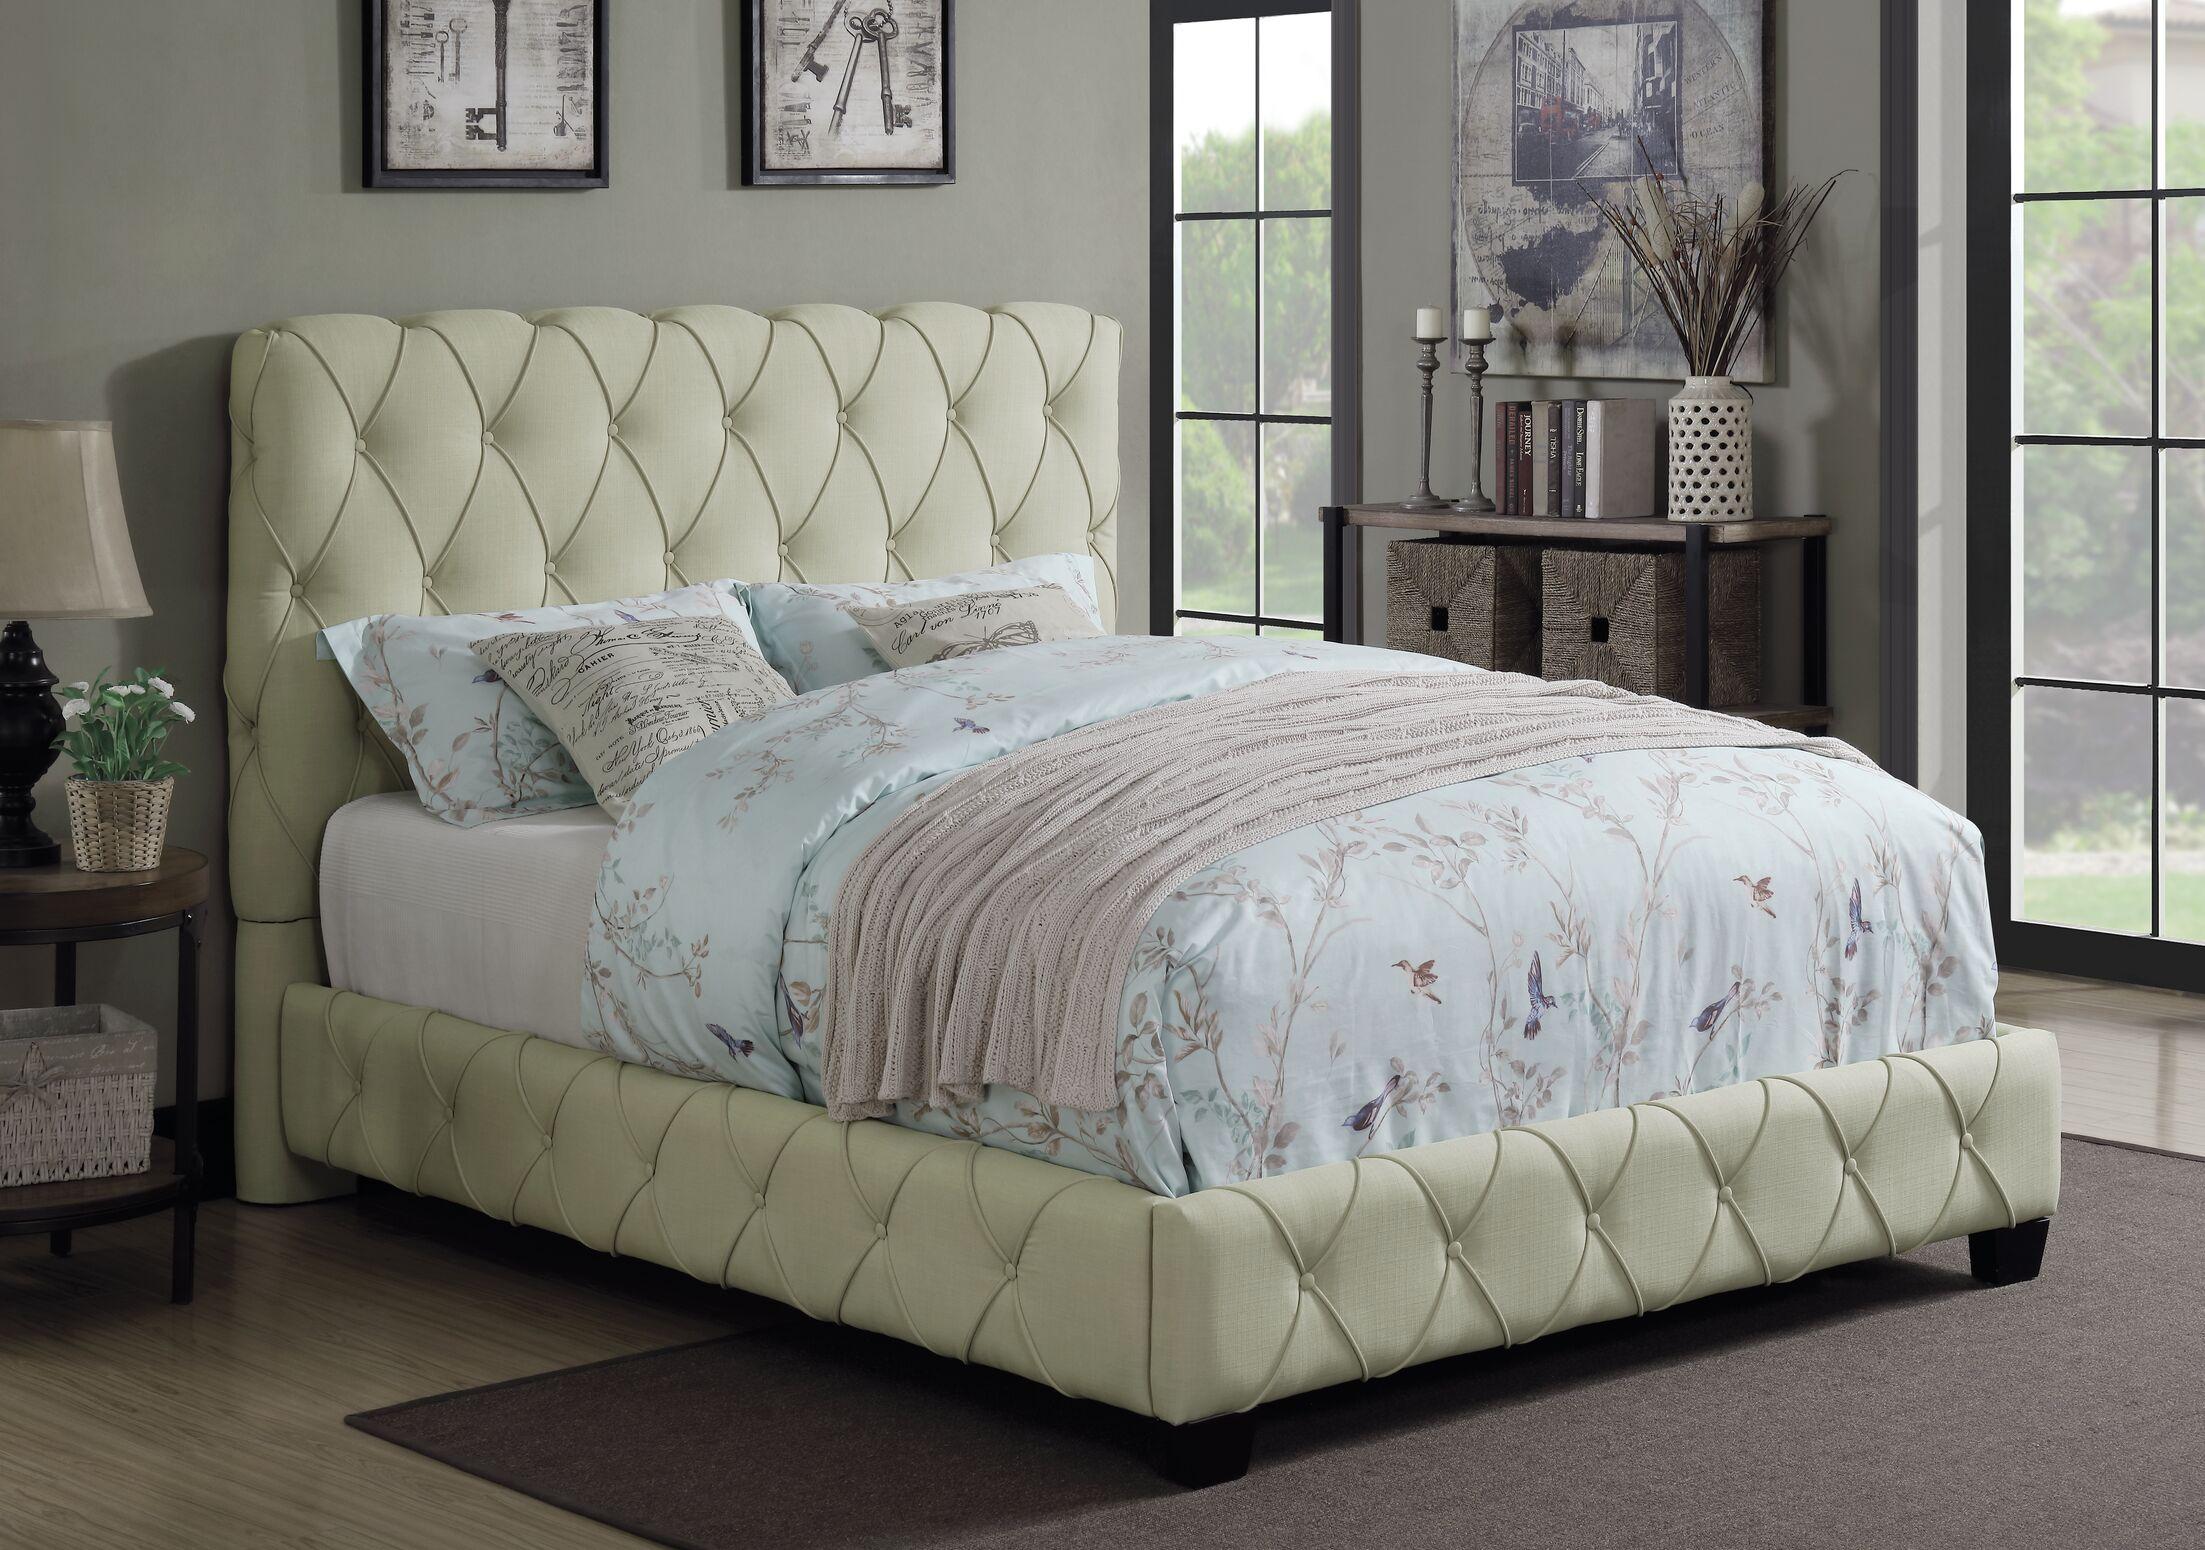 Nyla Upholstered Panel Bed